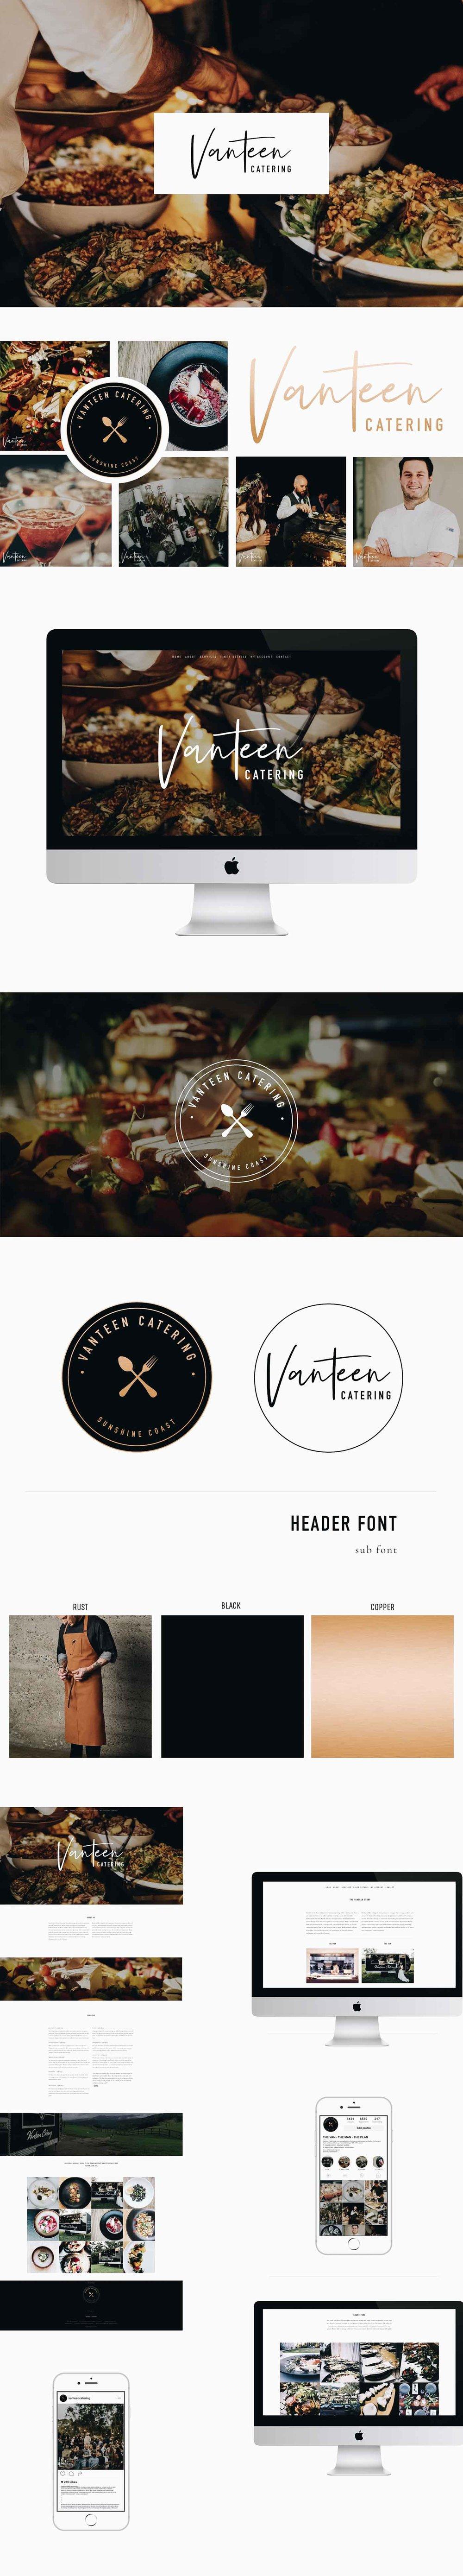 Imo Creative - Vanteen Catering - Brandng and Squrespace website design.jpg